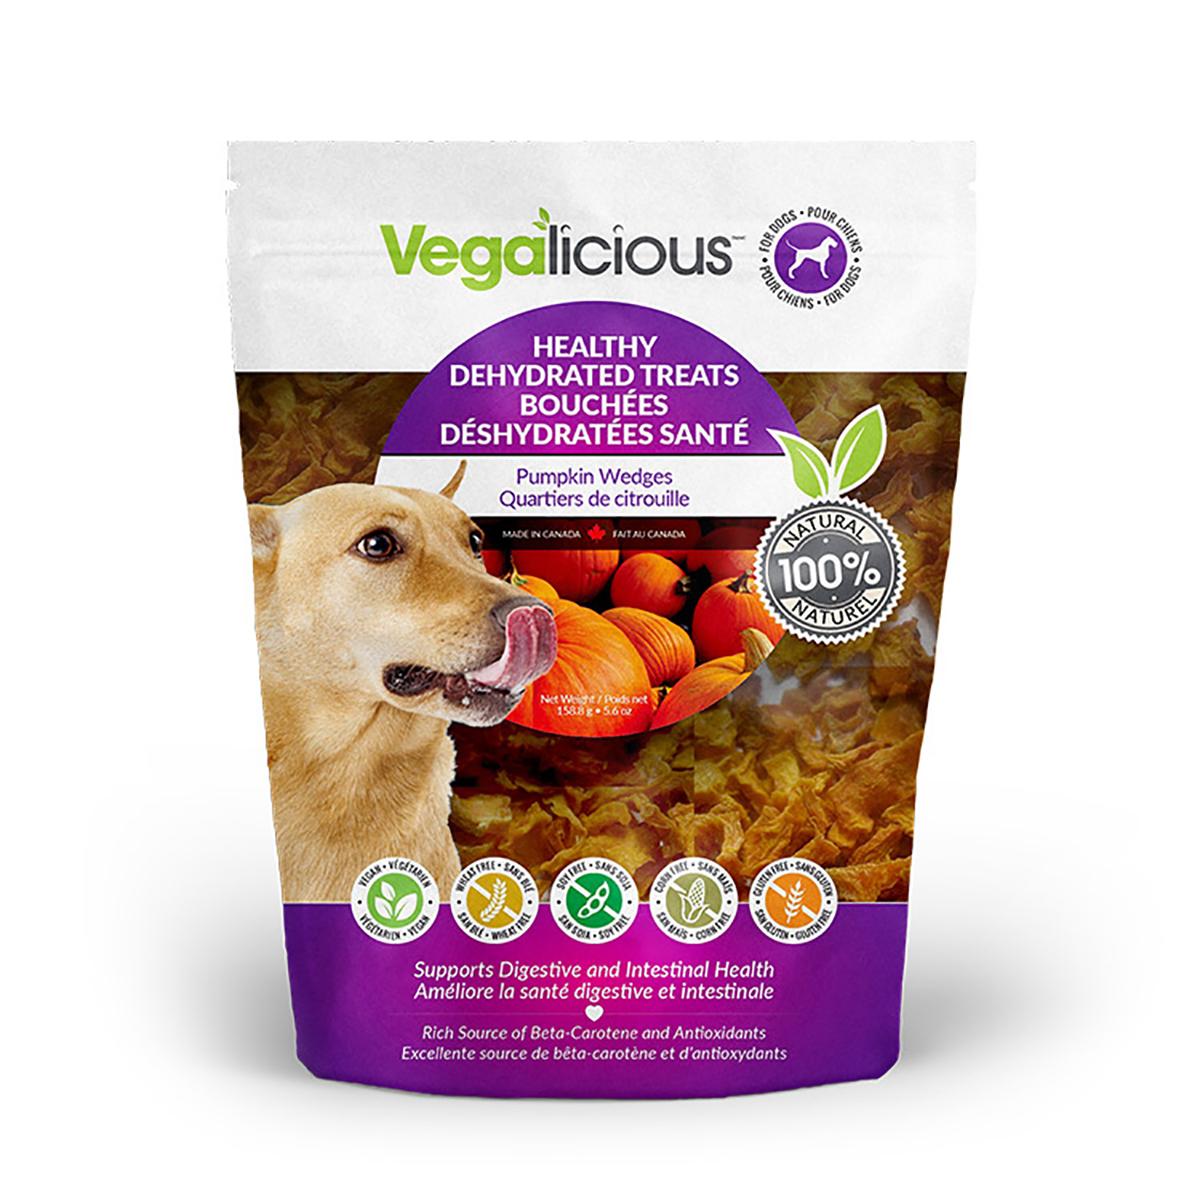 Vegalicious Healthy Dehydrated Dog Treats - Pumpkin Wedges